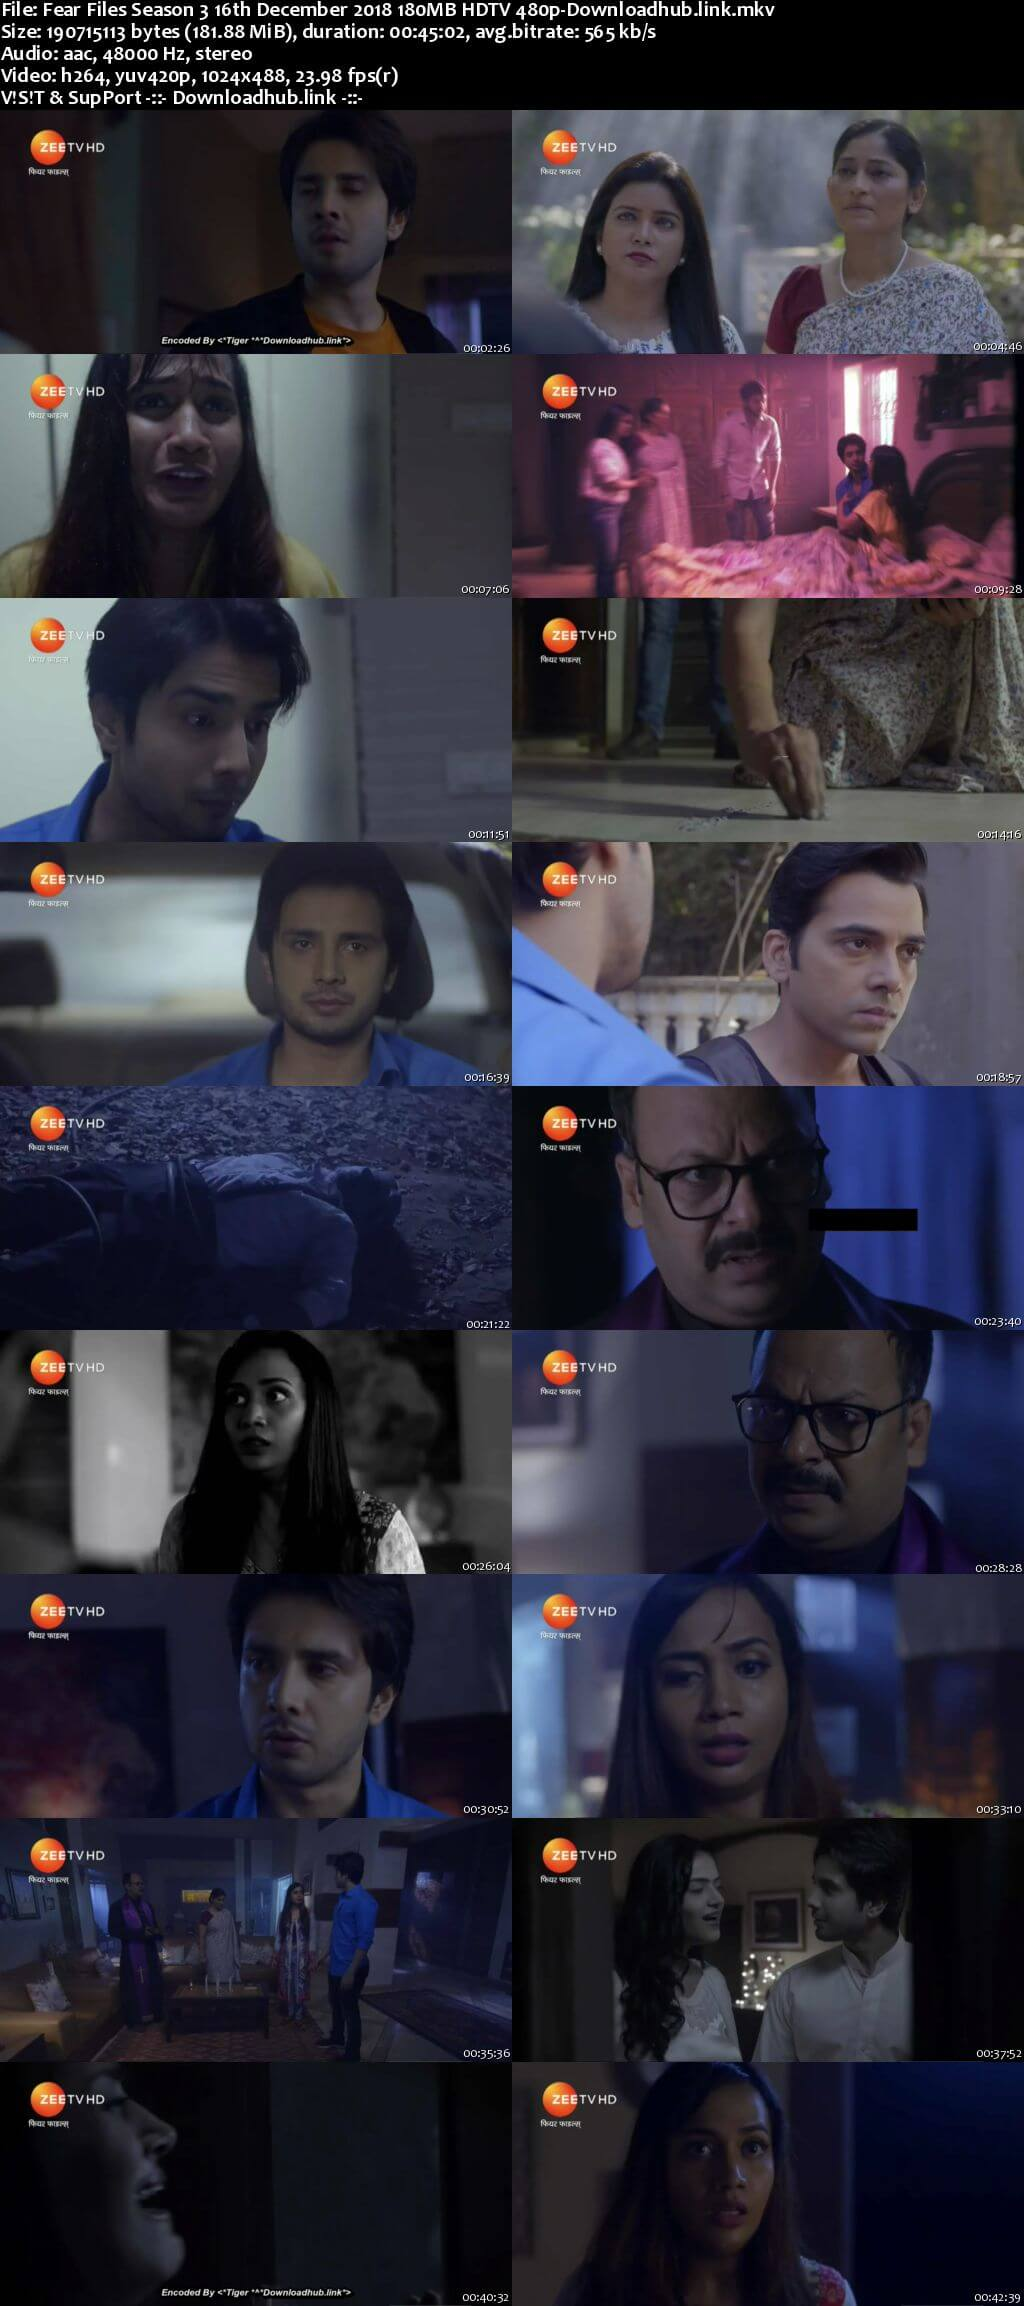 Fear Files Season 3 16th December 2018 180MB HDTV 480p